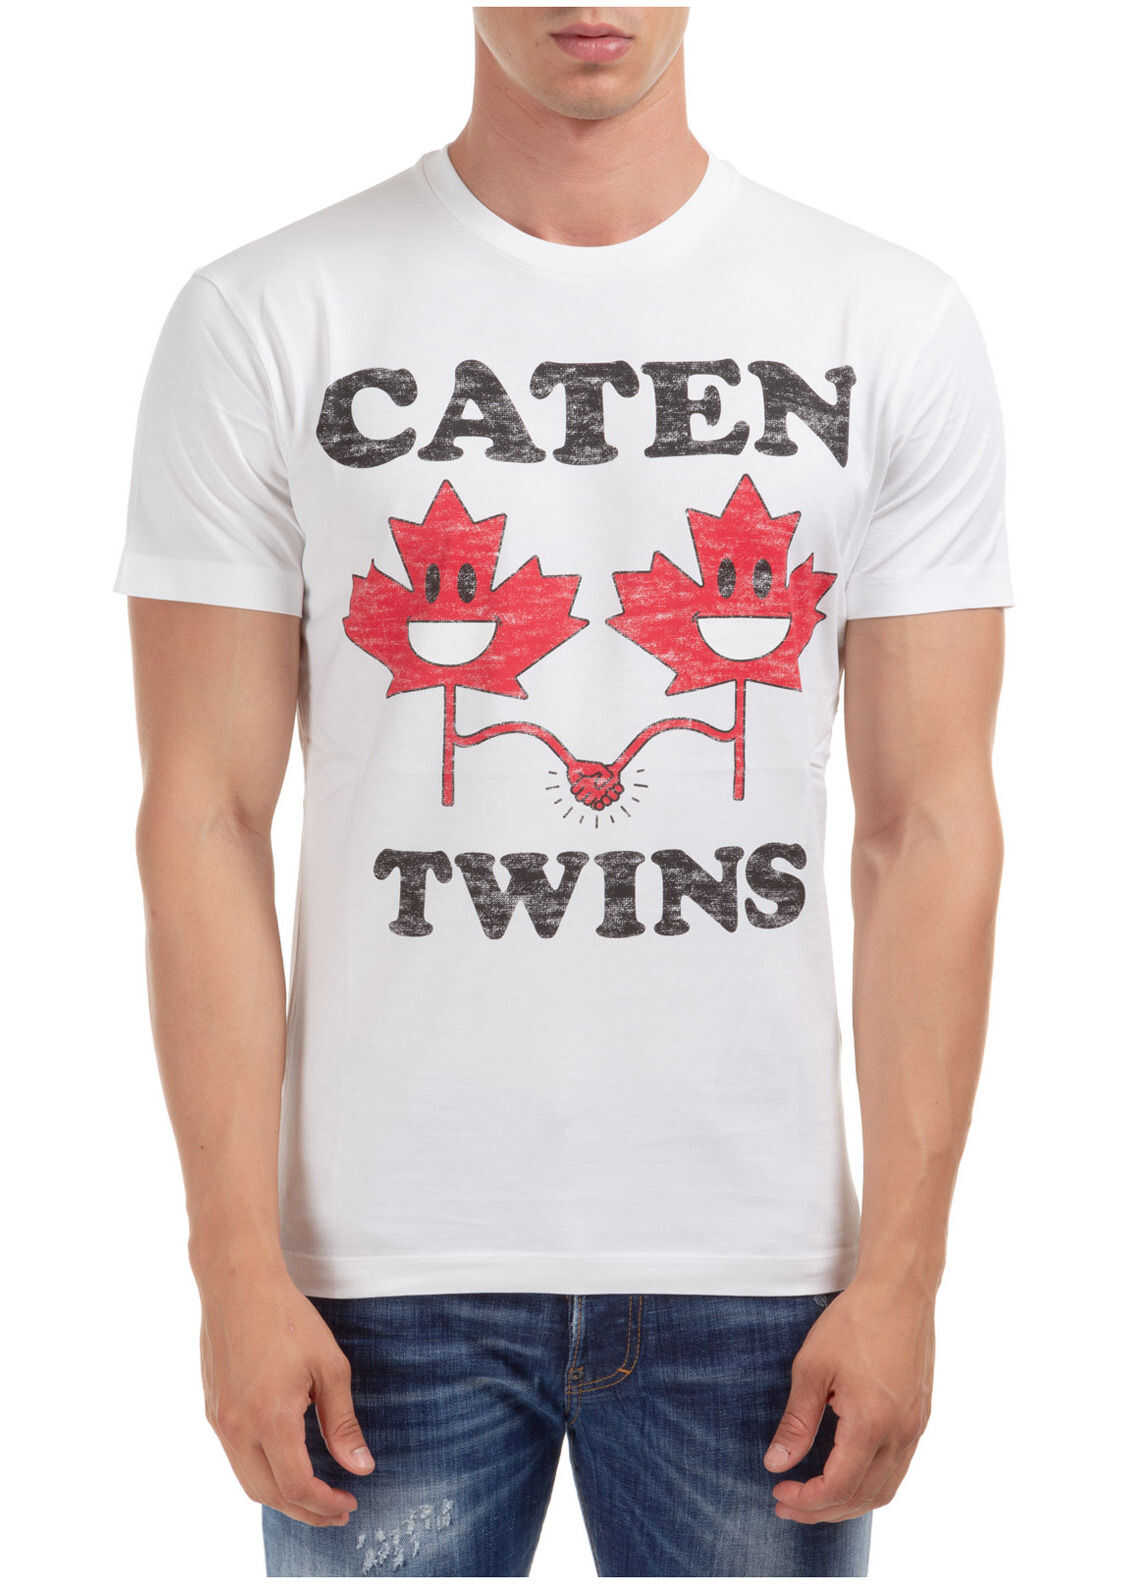 DSQUARED2 Short Sleeve T-Shirt Crew Neckline Jumper Caten'twins White imagine